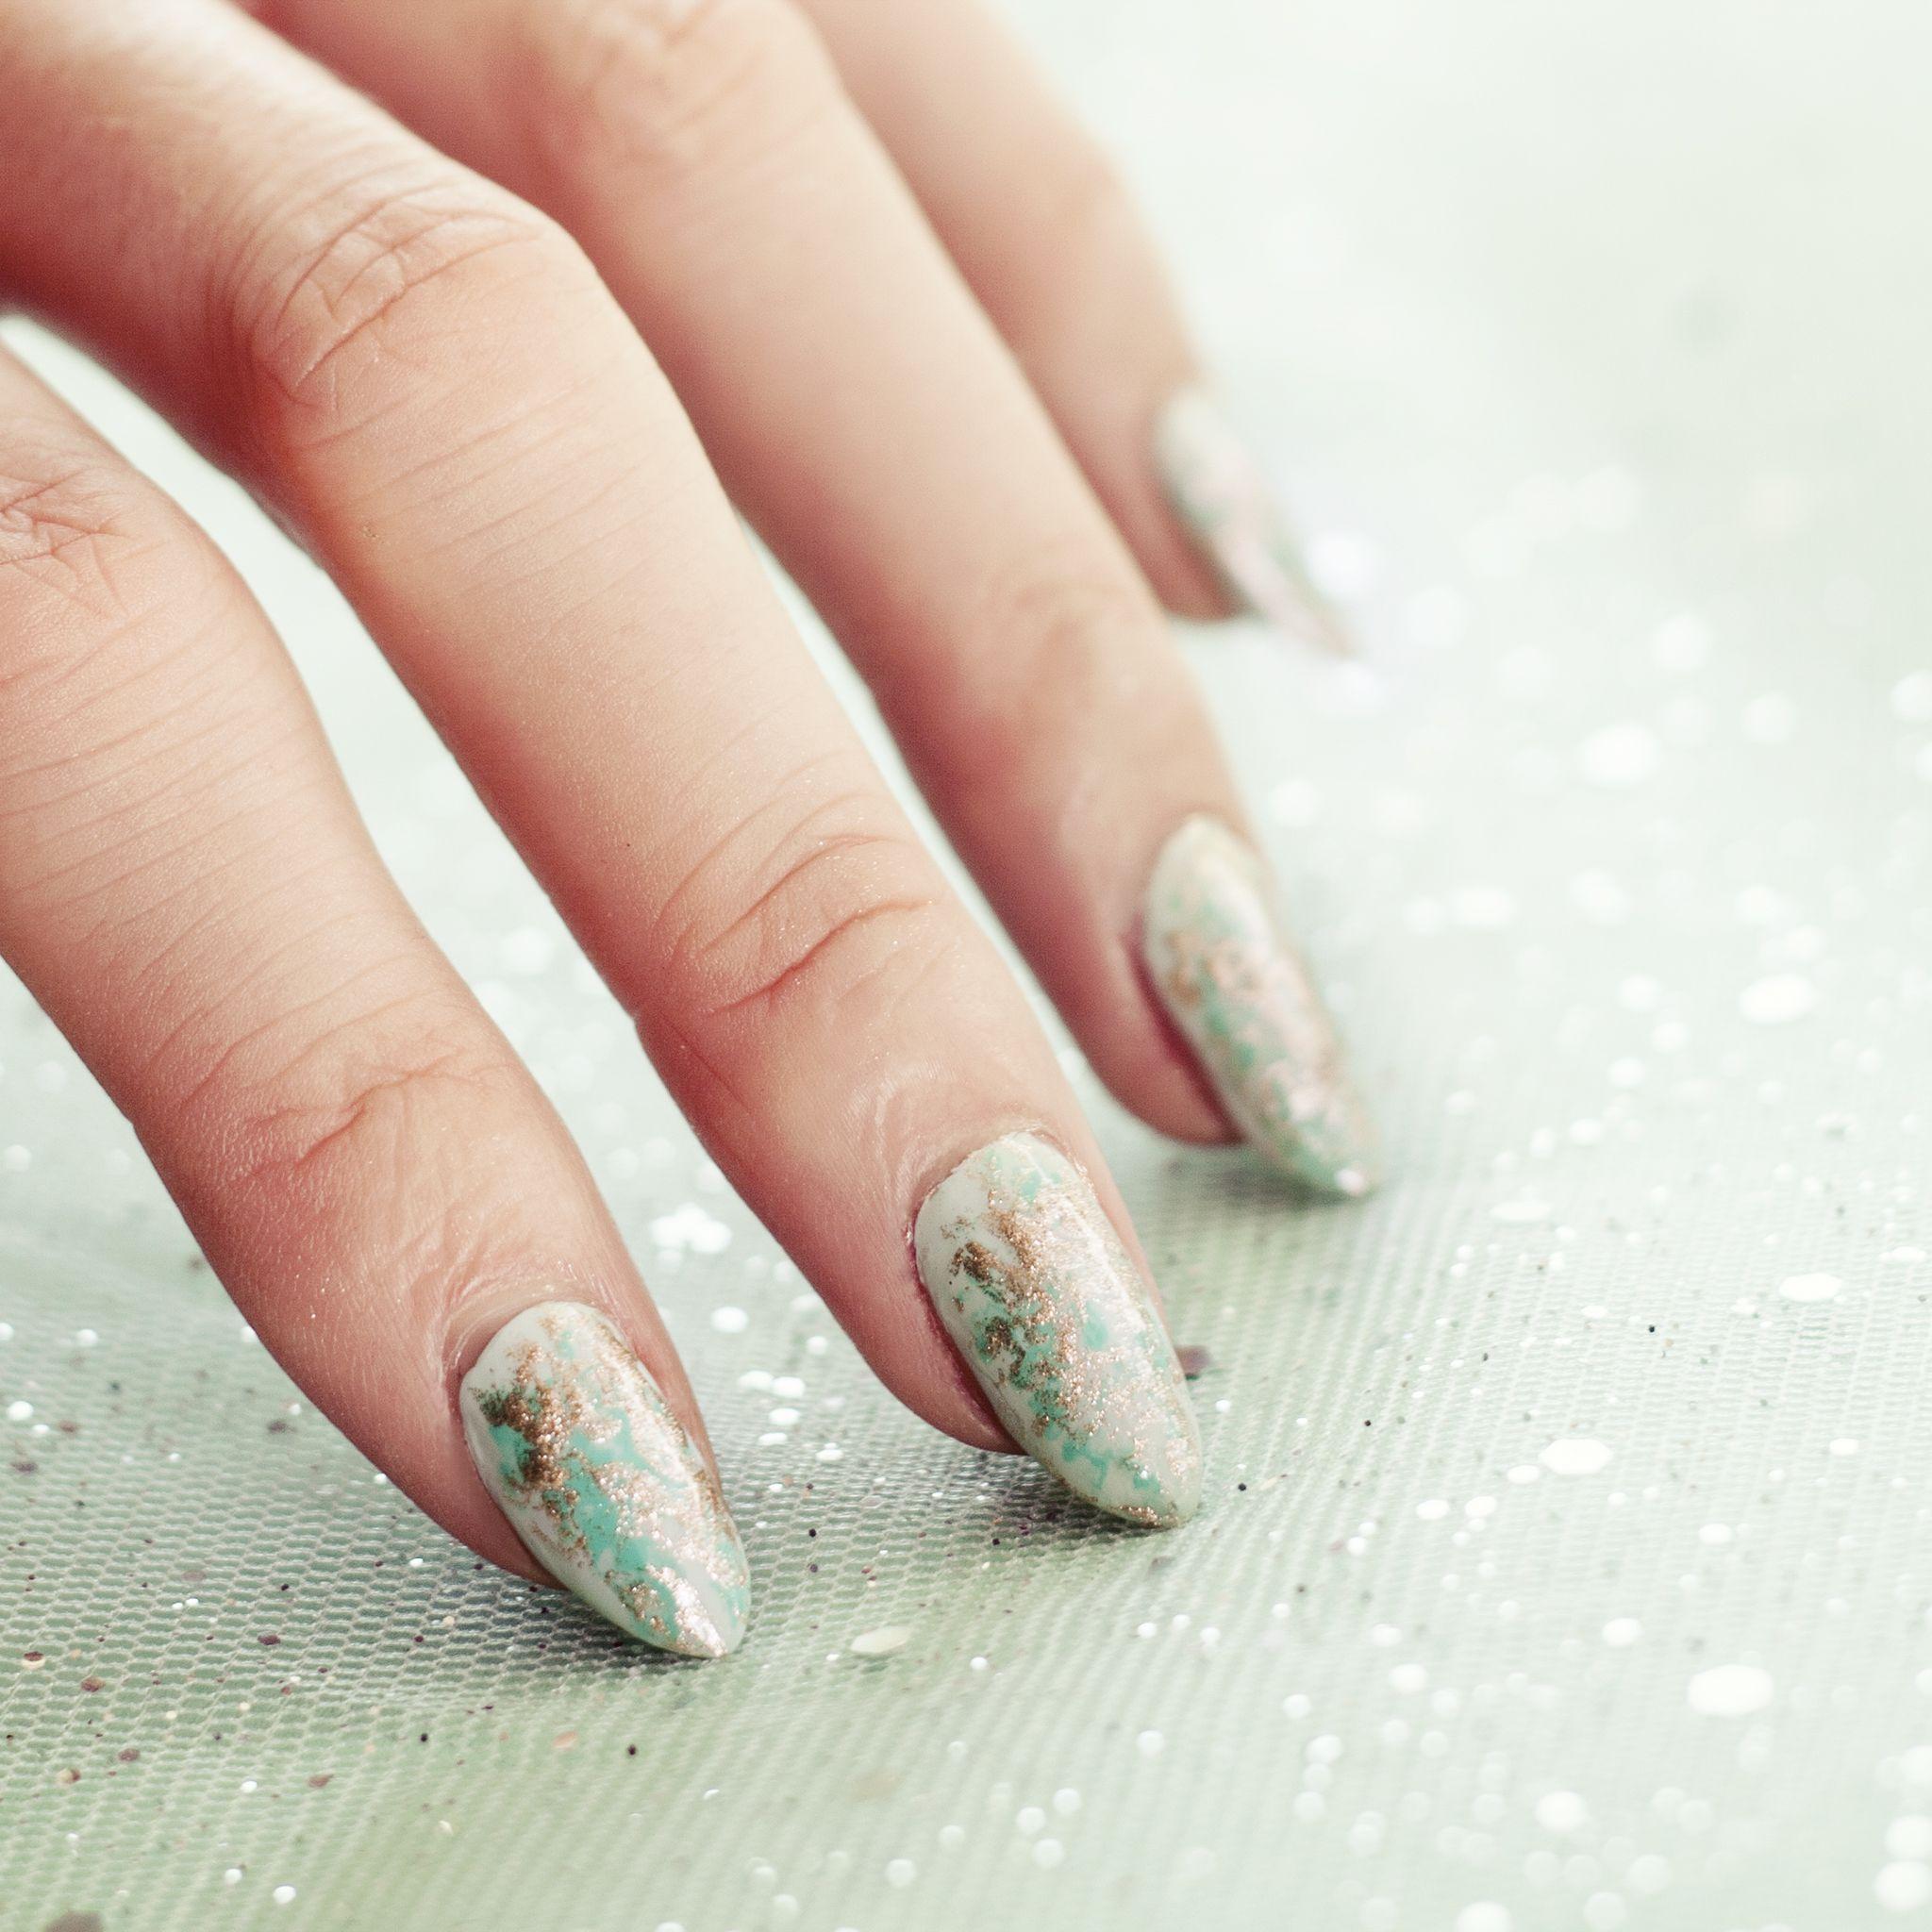 Aluminium Foil Nails Nail Art Tutorial A Very Easy Nail Tutorial